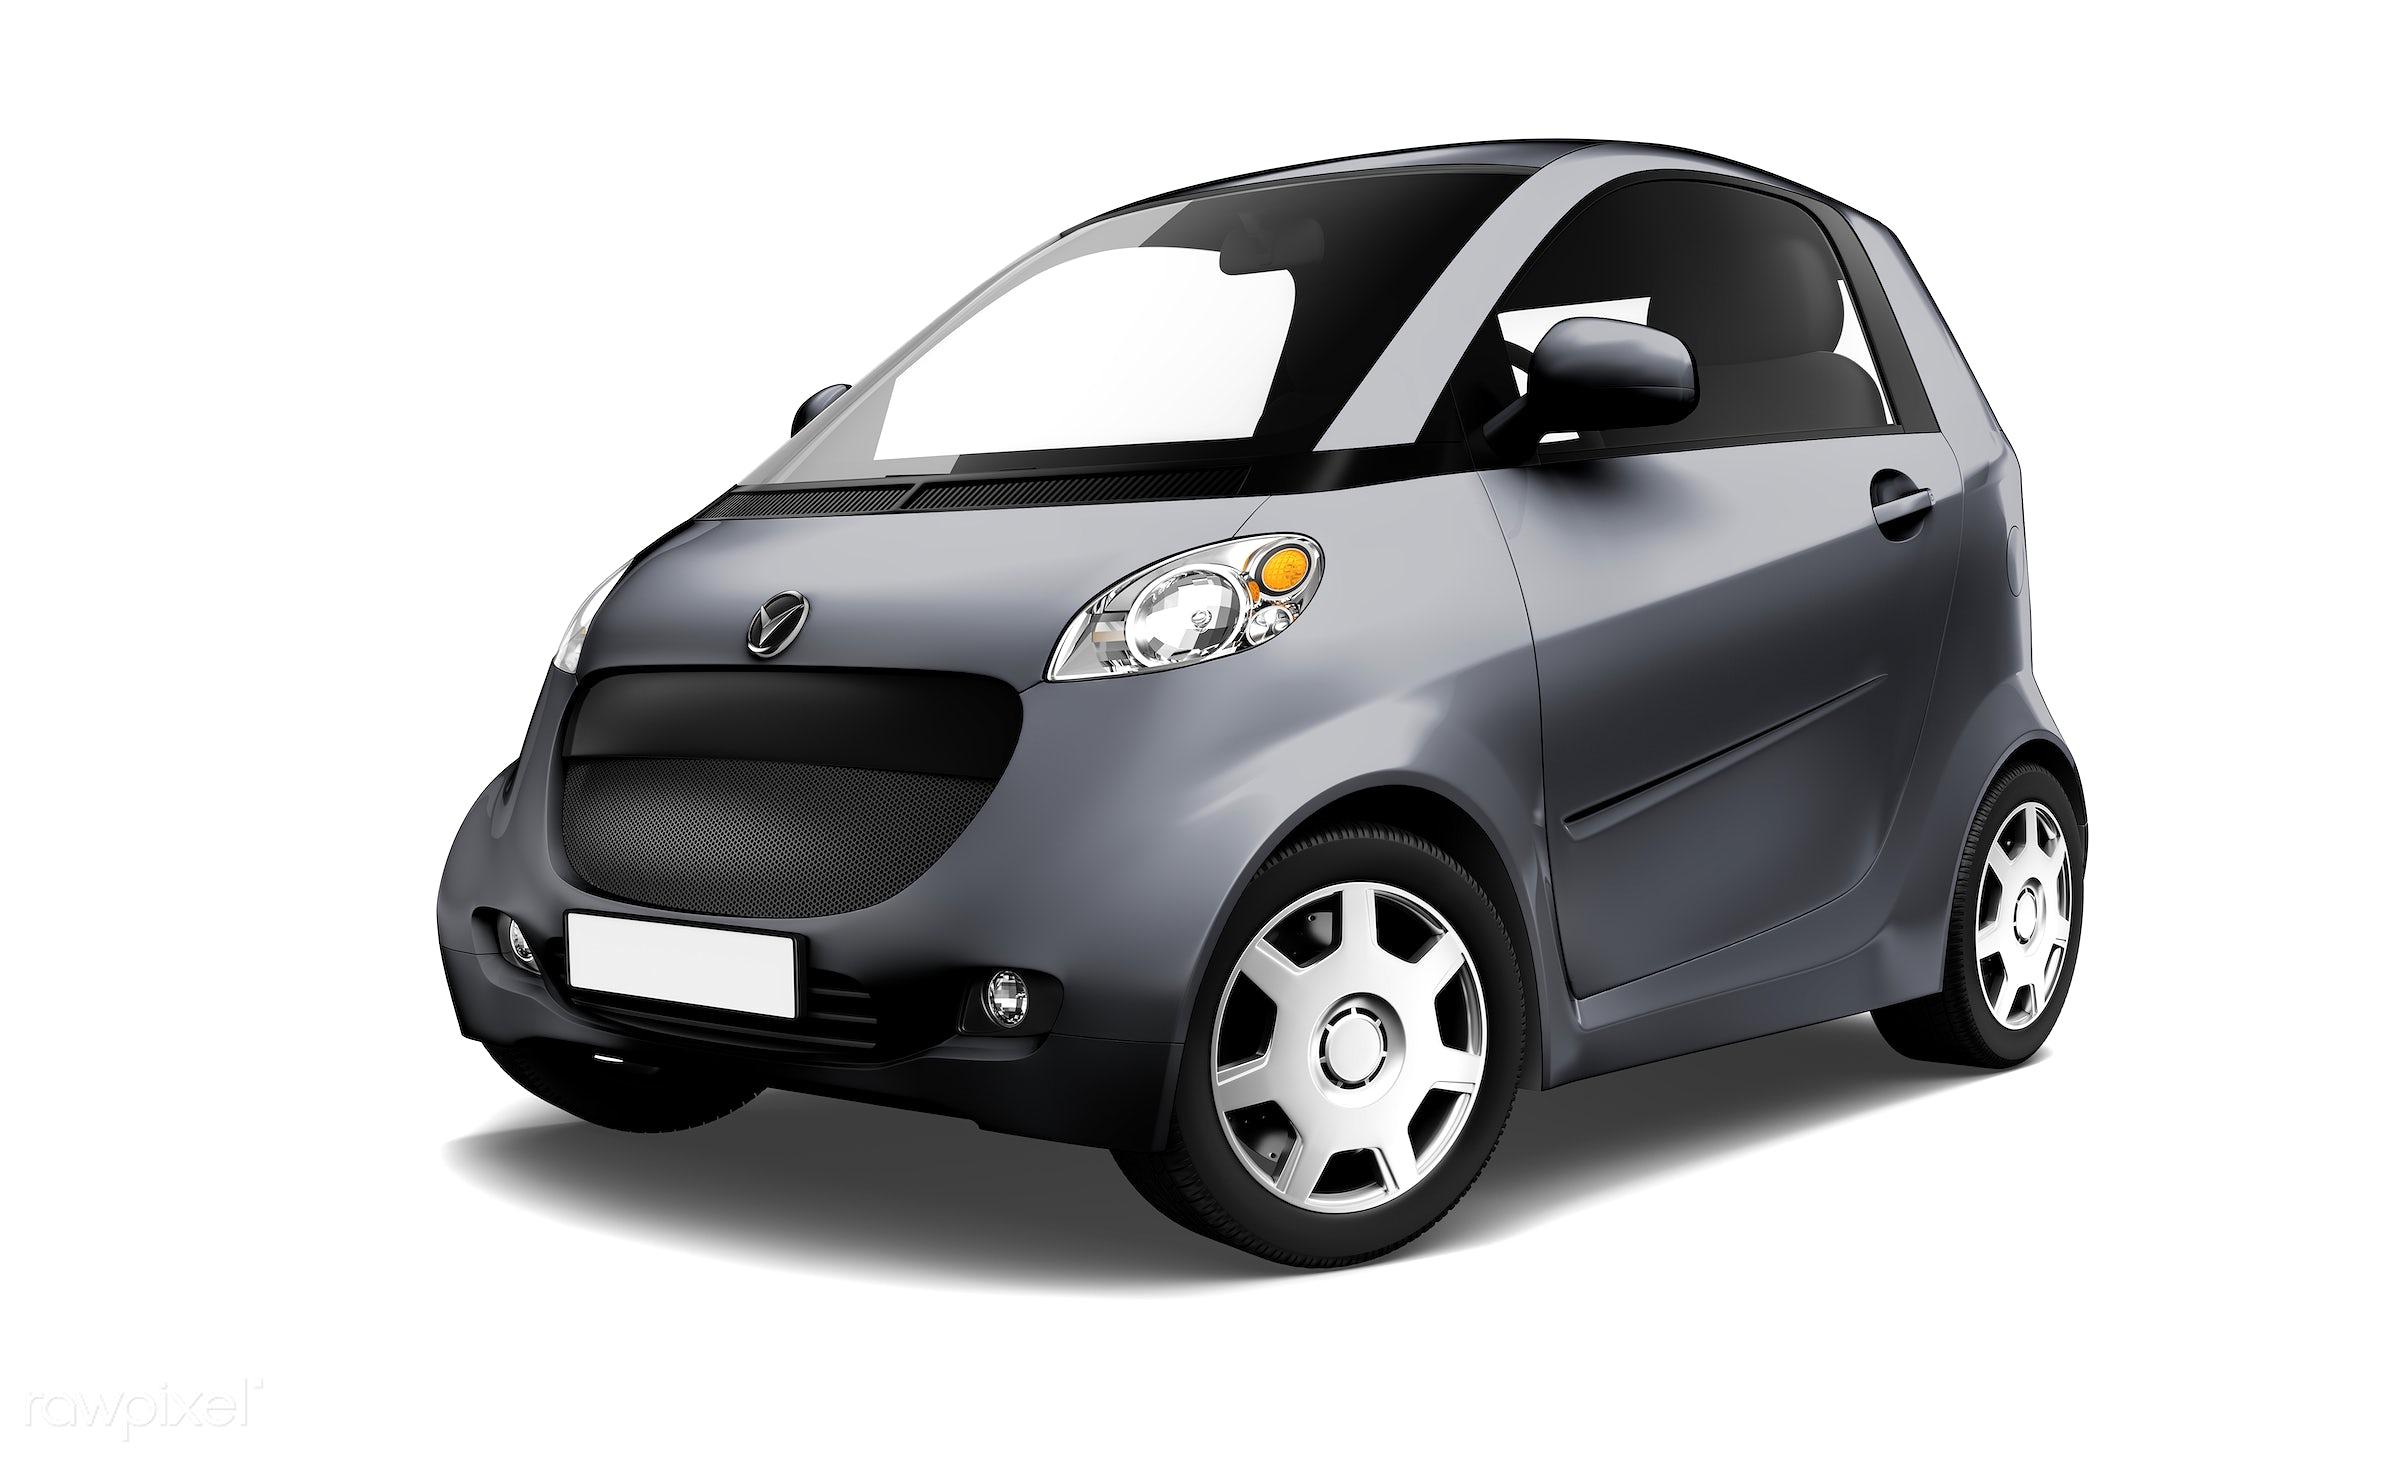 Three dimensional image of car - 3d, automobile, automotive, black, brandless, car, concept car, eco, eco car, graphic,...